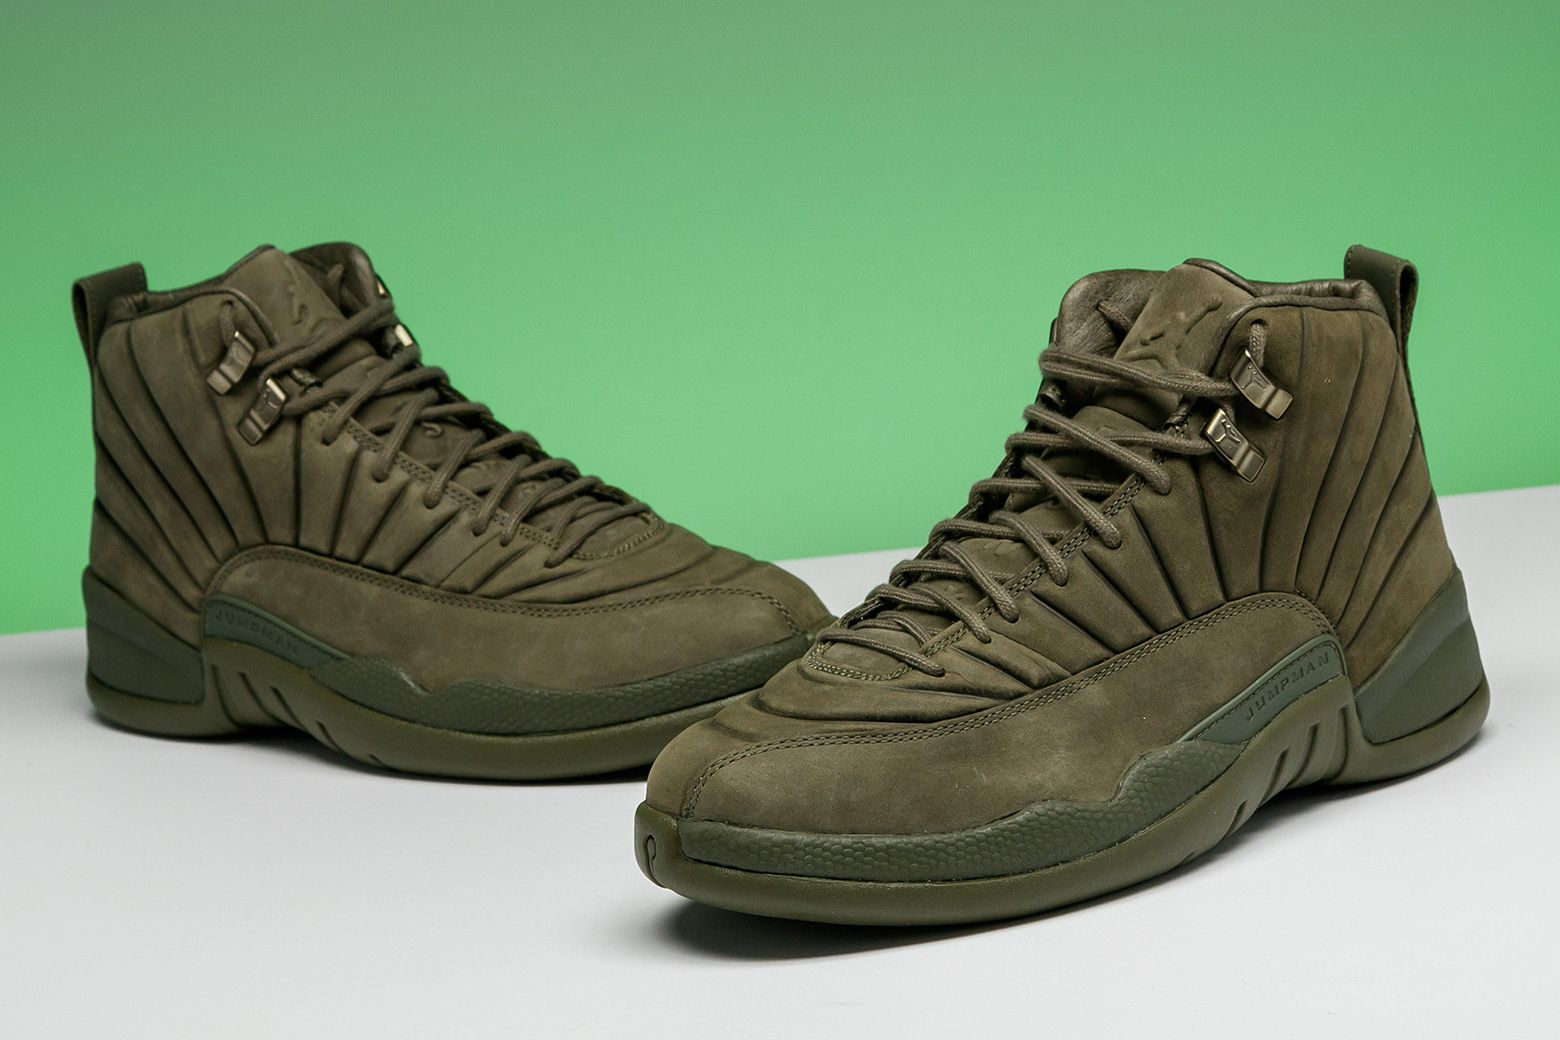 6bcb6499b5cb Sneaker Trivia  What city did this PSNY x Air Jordan 12 release in ...